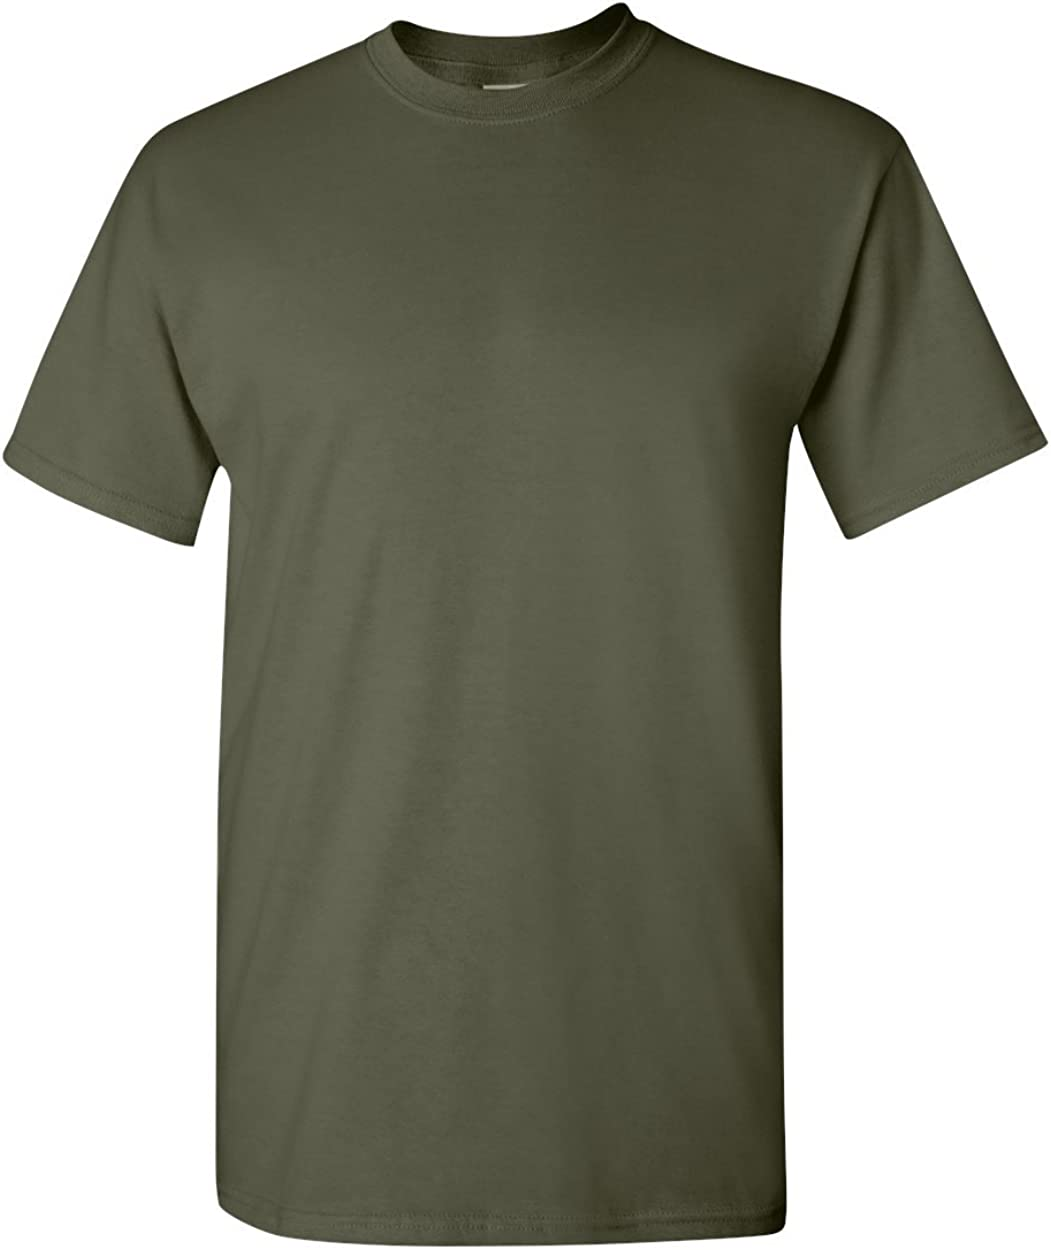 Gildan 5.3oz Heavy Cotton Short Sleeve T-Shirt, Military Green, Large